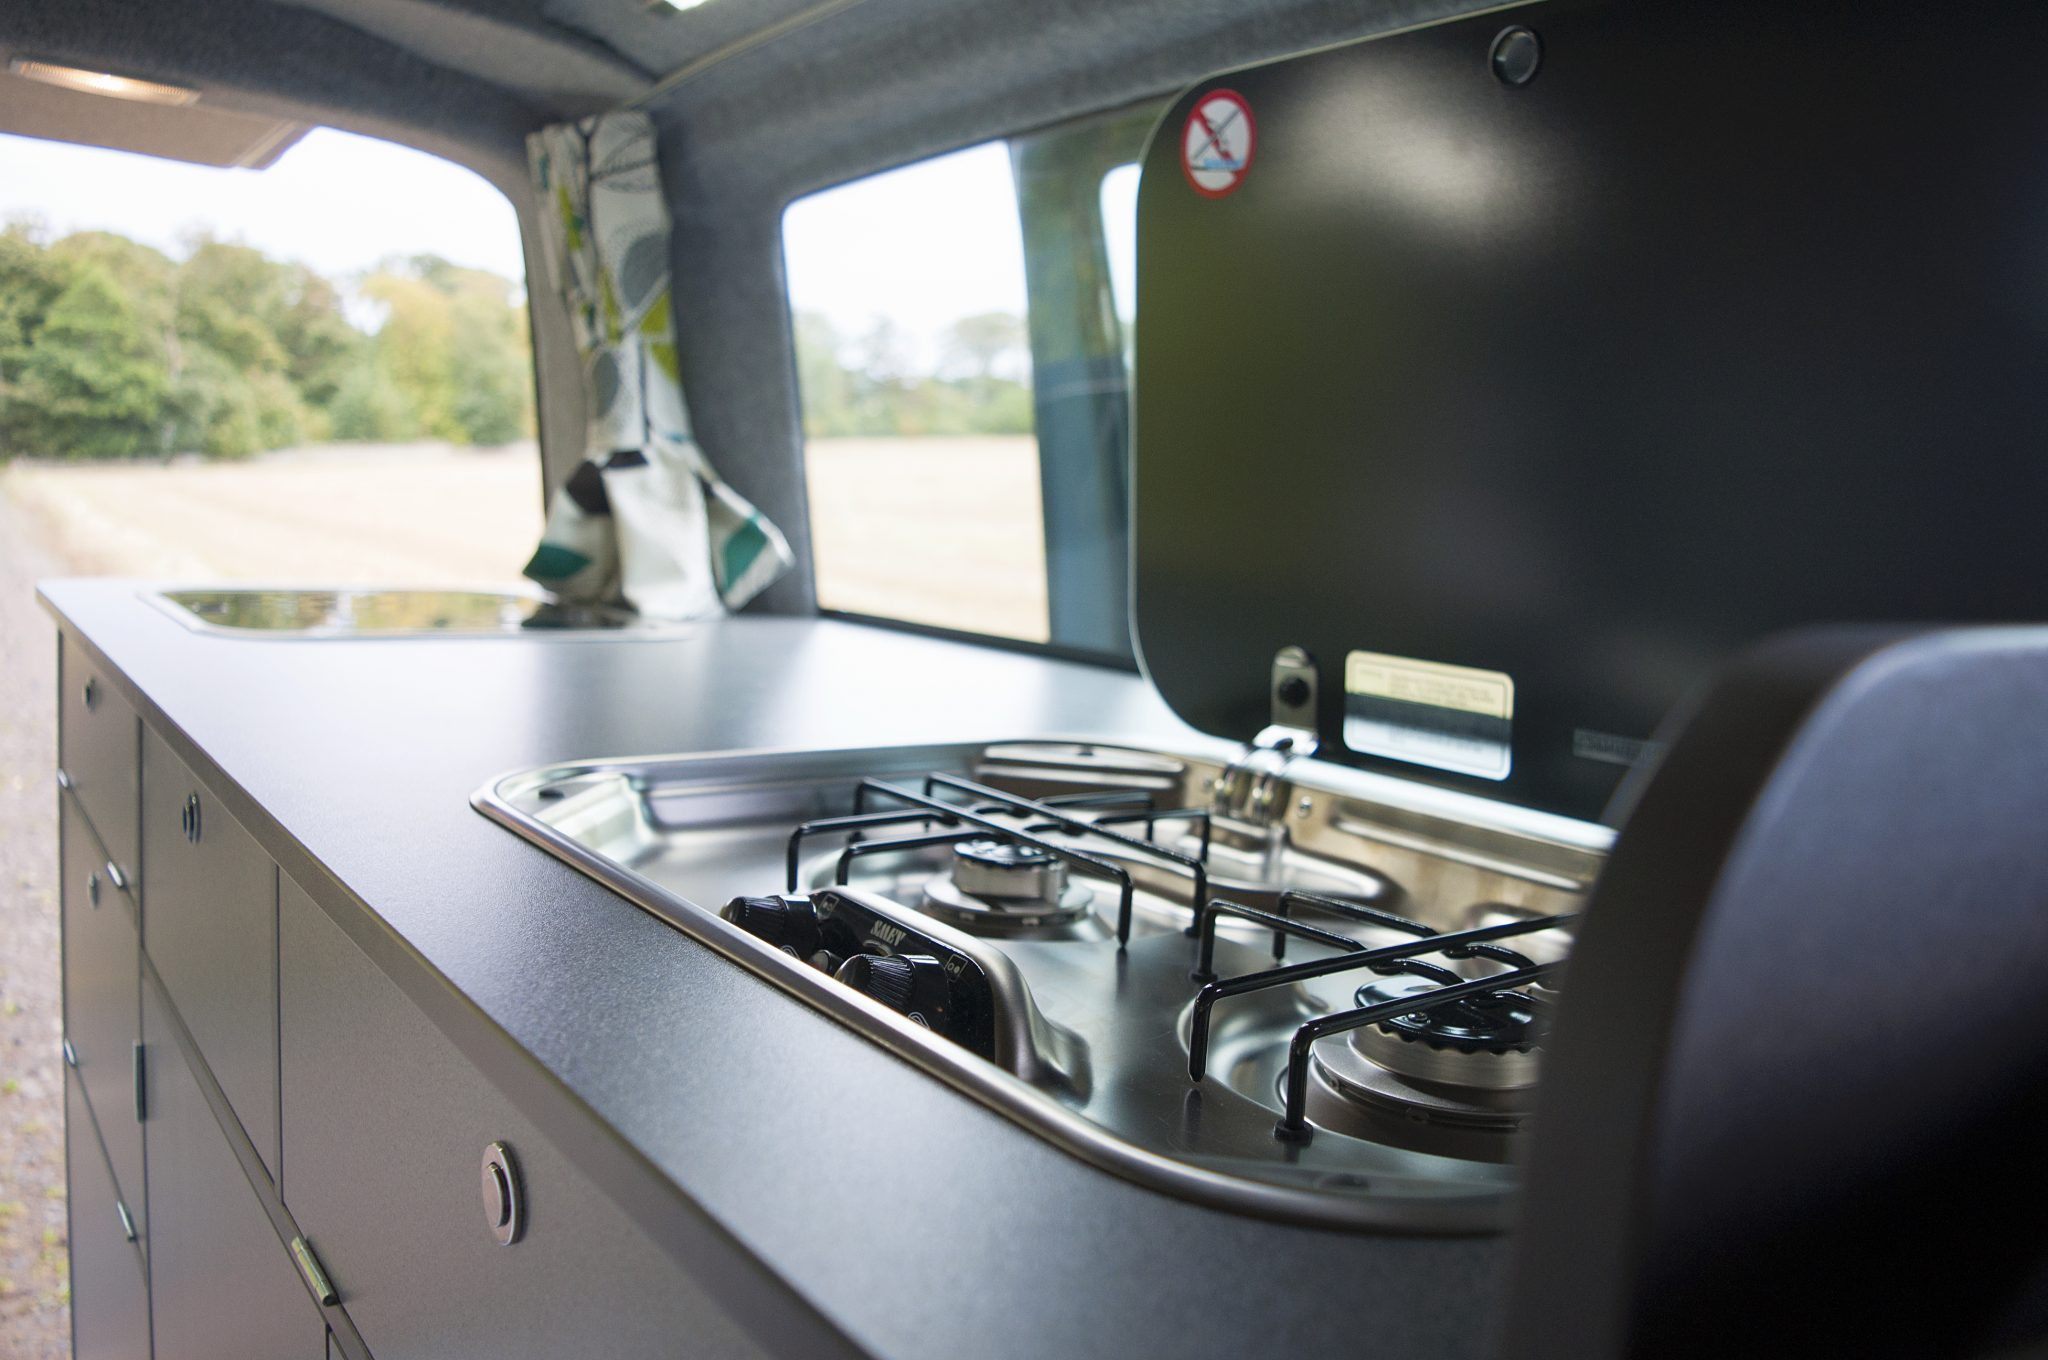 4 berth campervan with toilet